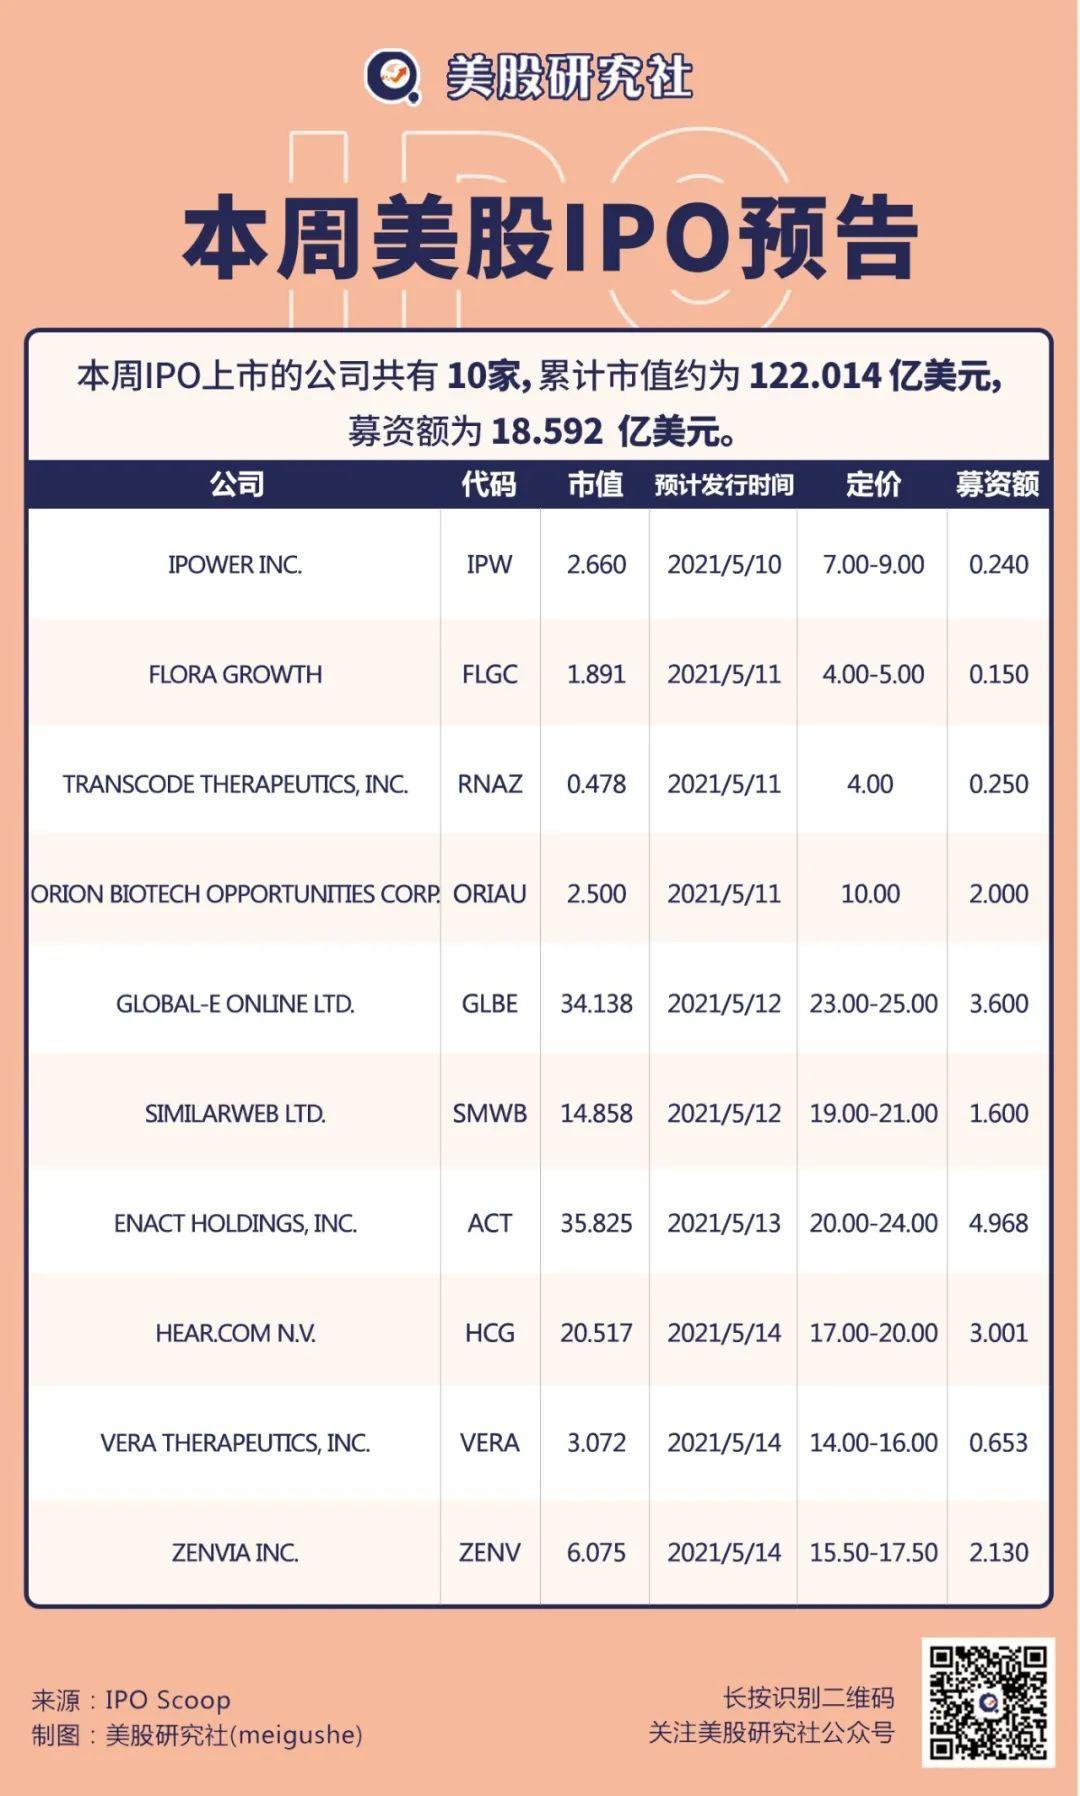 【IPO前线】本周10家公司将登陆美股,互联网分析商SimilarWeb周三上市